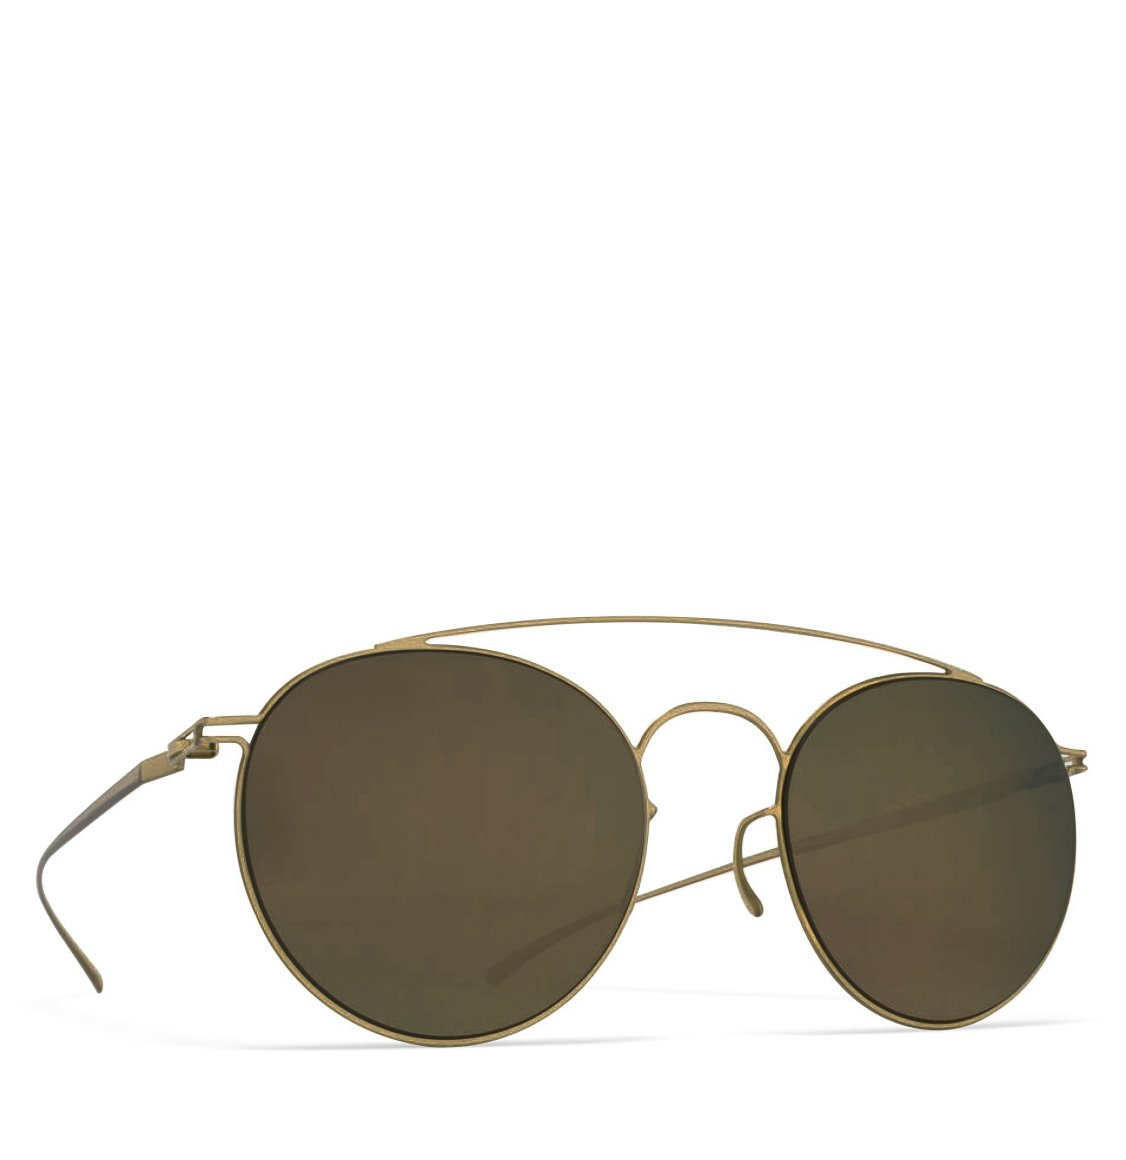 Mykita x Maison Martin Margiela Aviator-Frame Champagne Sunglasses